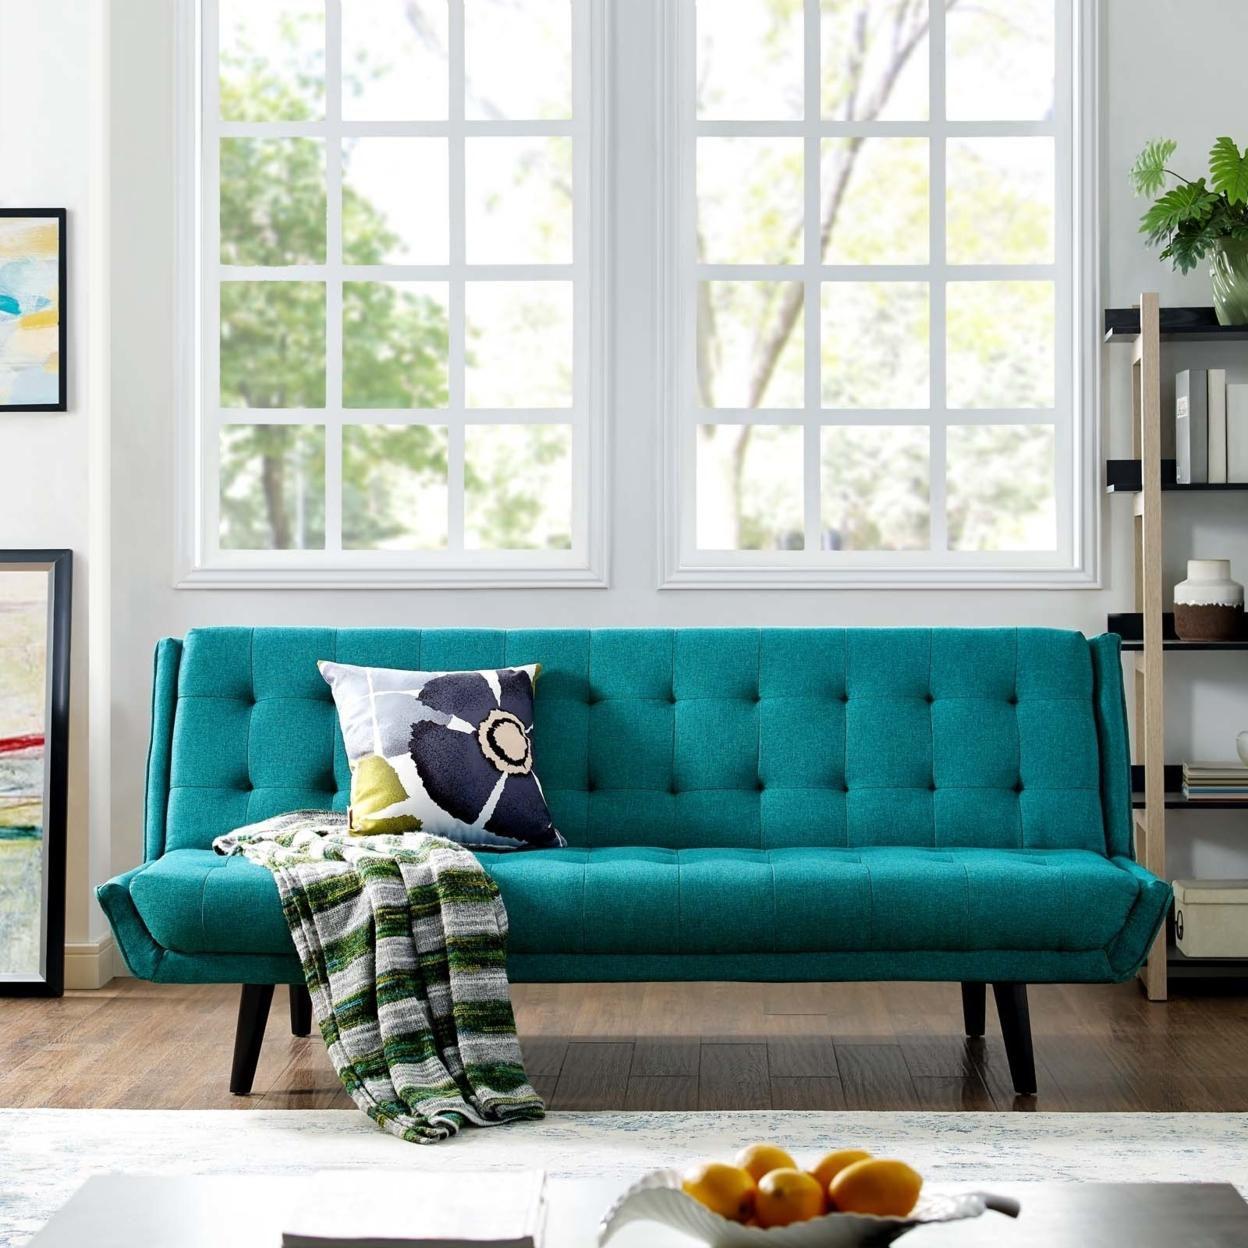 Glance Tufted Convertible Fabric Sofa Bed (3093-TEA)